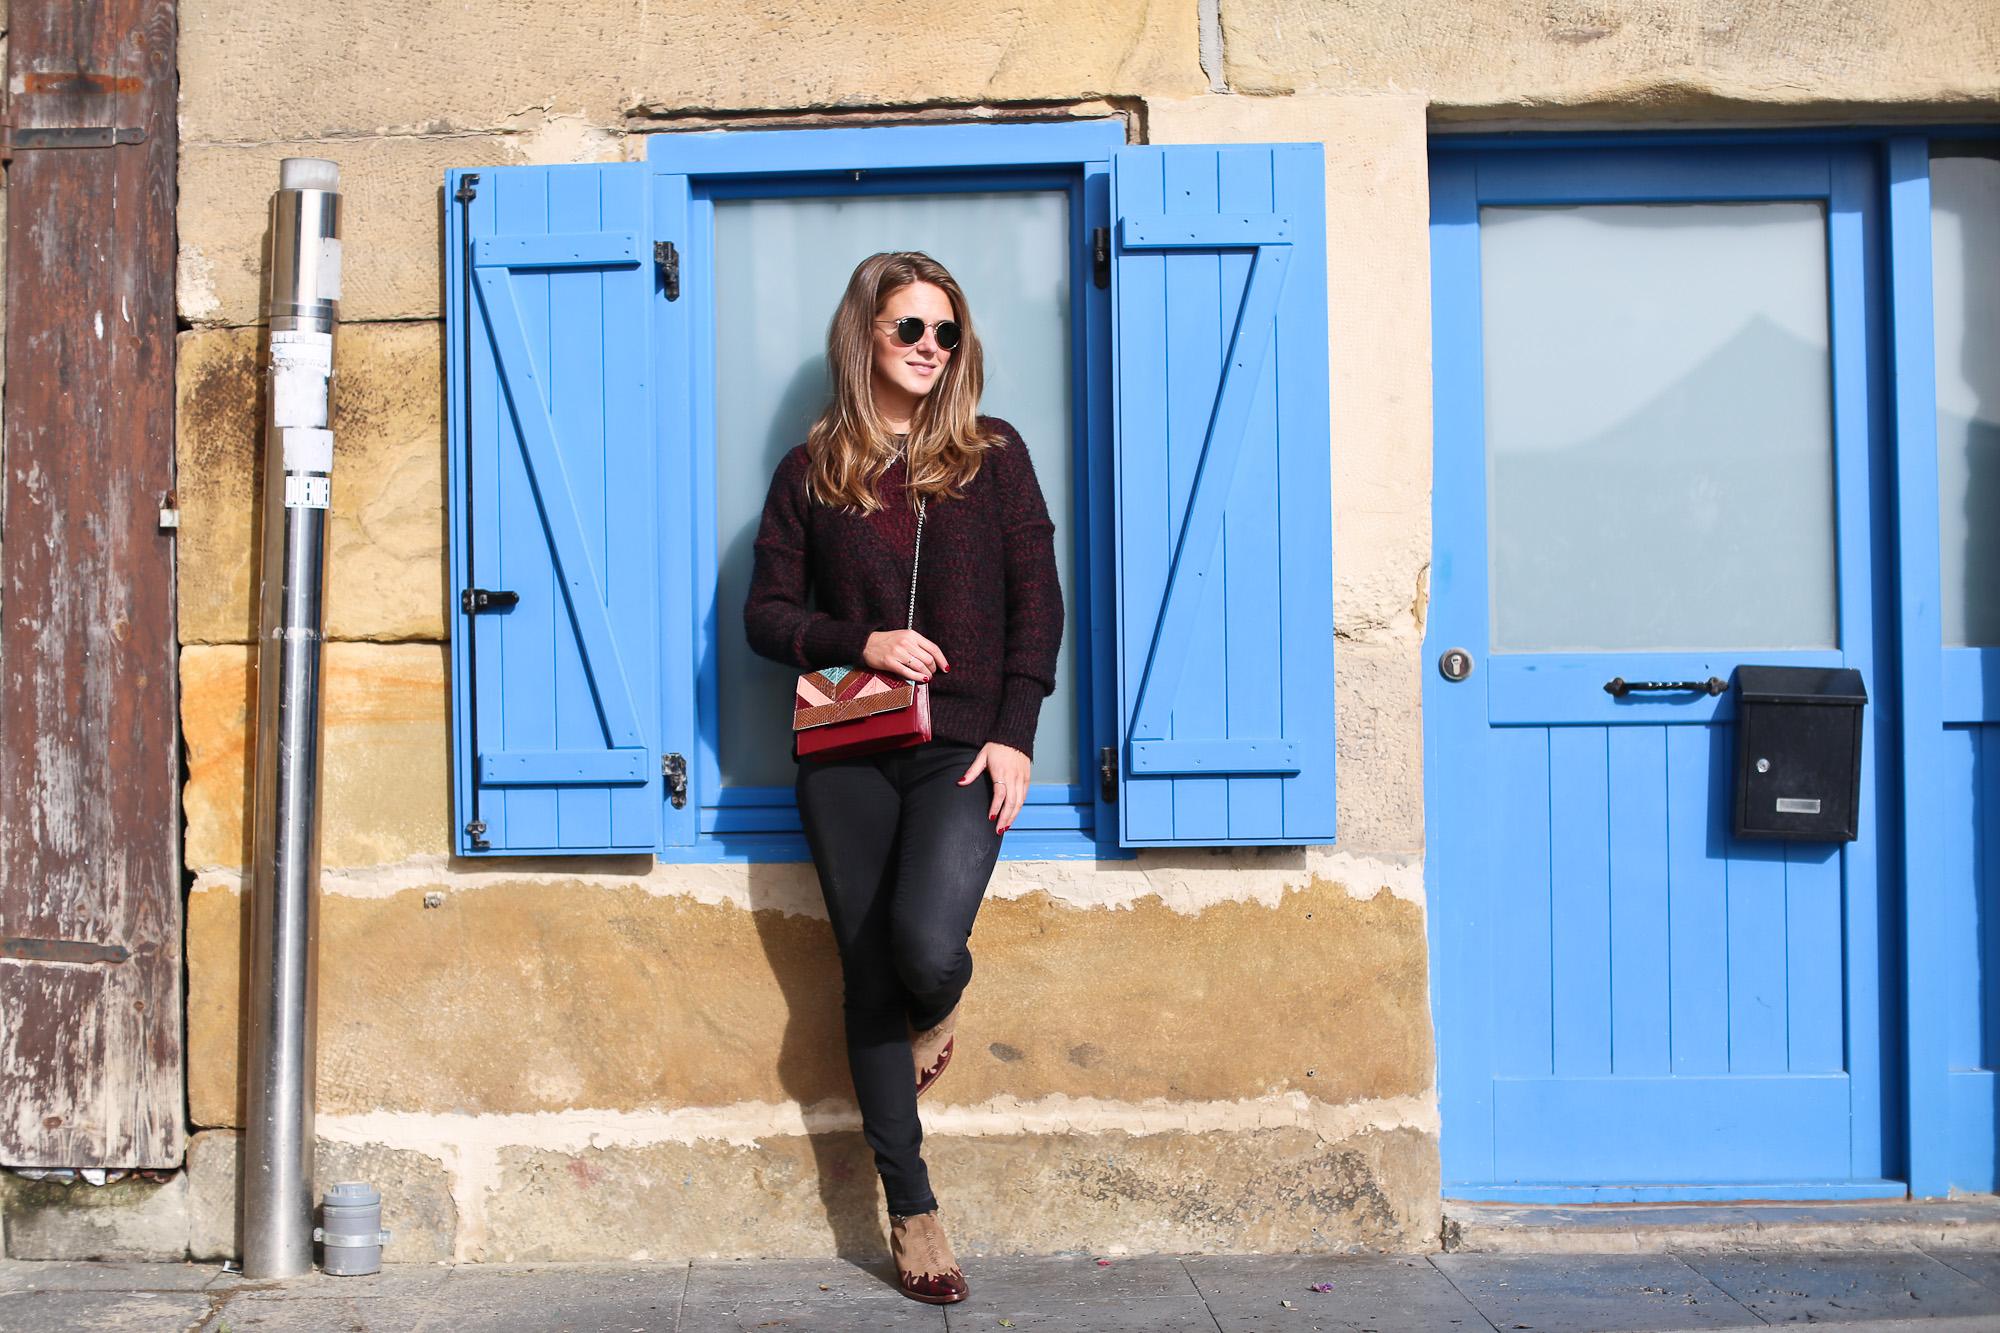 Clochet_streetstyle_fashionblogger_zadig&voltaire_suedewesternankleboots_cowboyboots_aviatorjacket_titamadridespiga-8